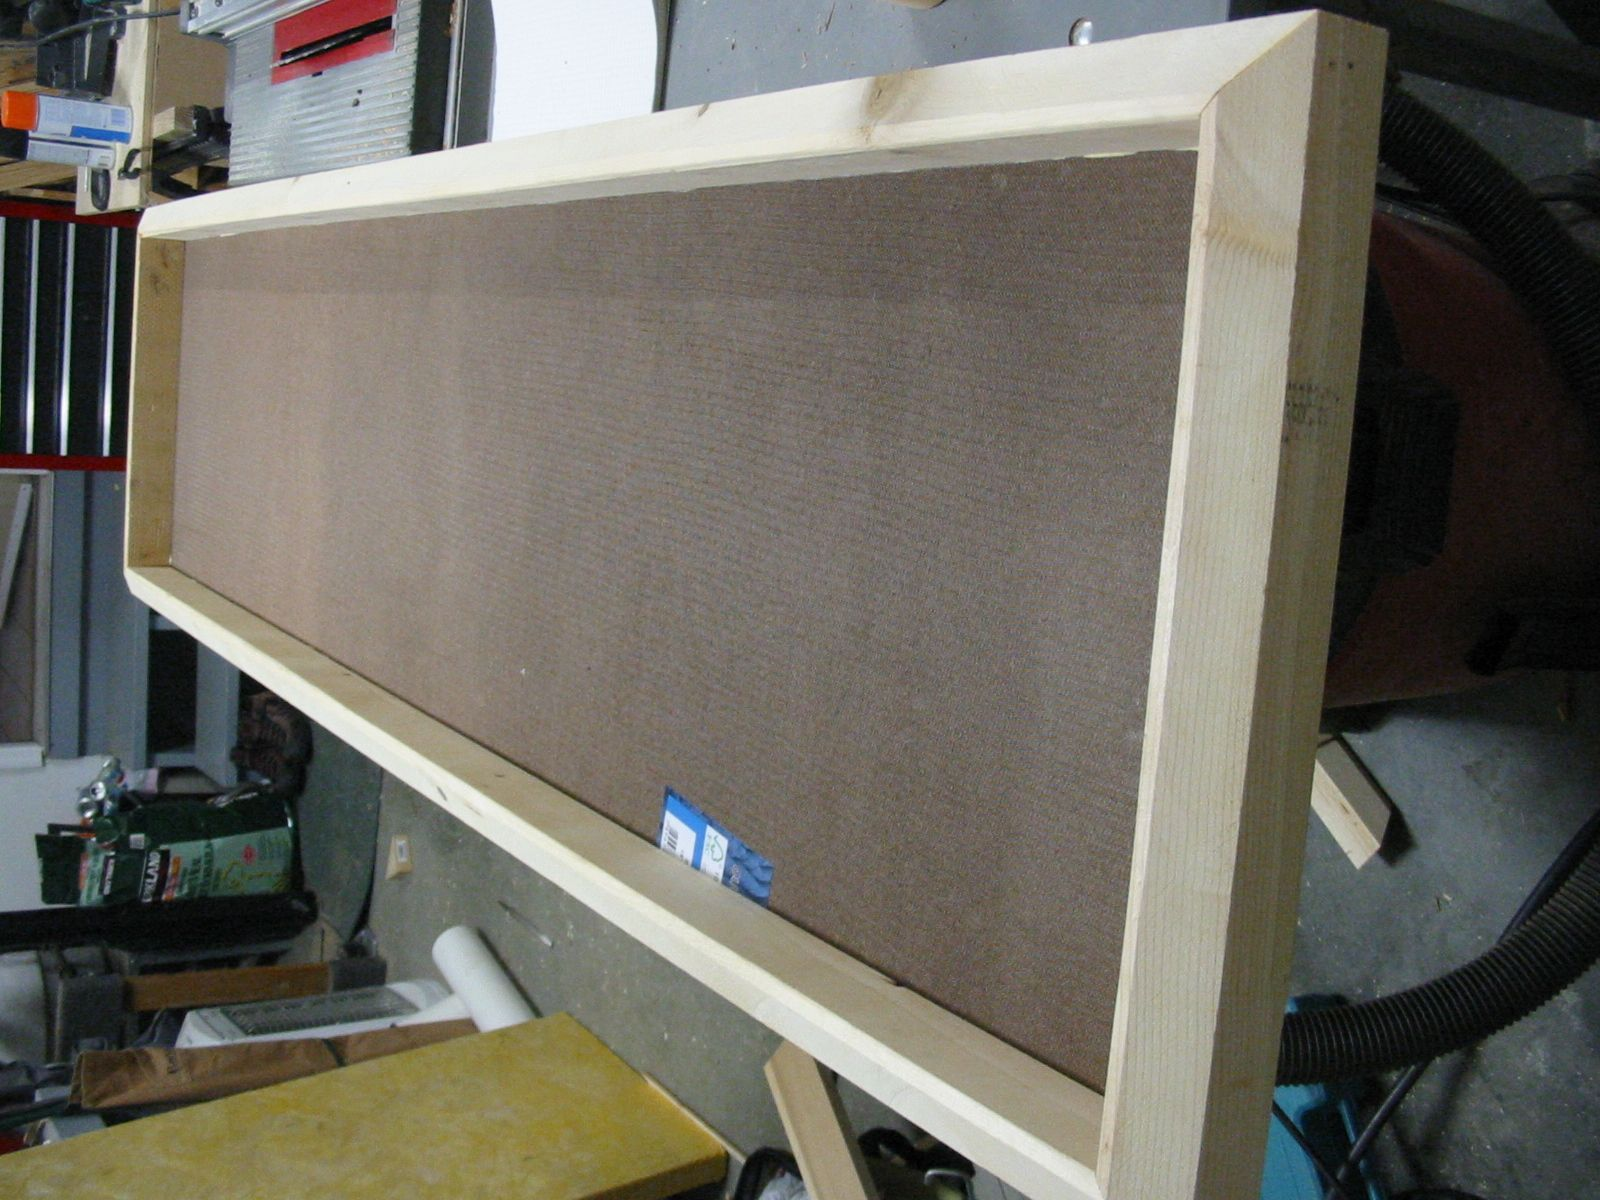 DIY Acoustic Panels Using Owens Corning  Theater Pinterest - Diy basement wall panels